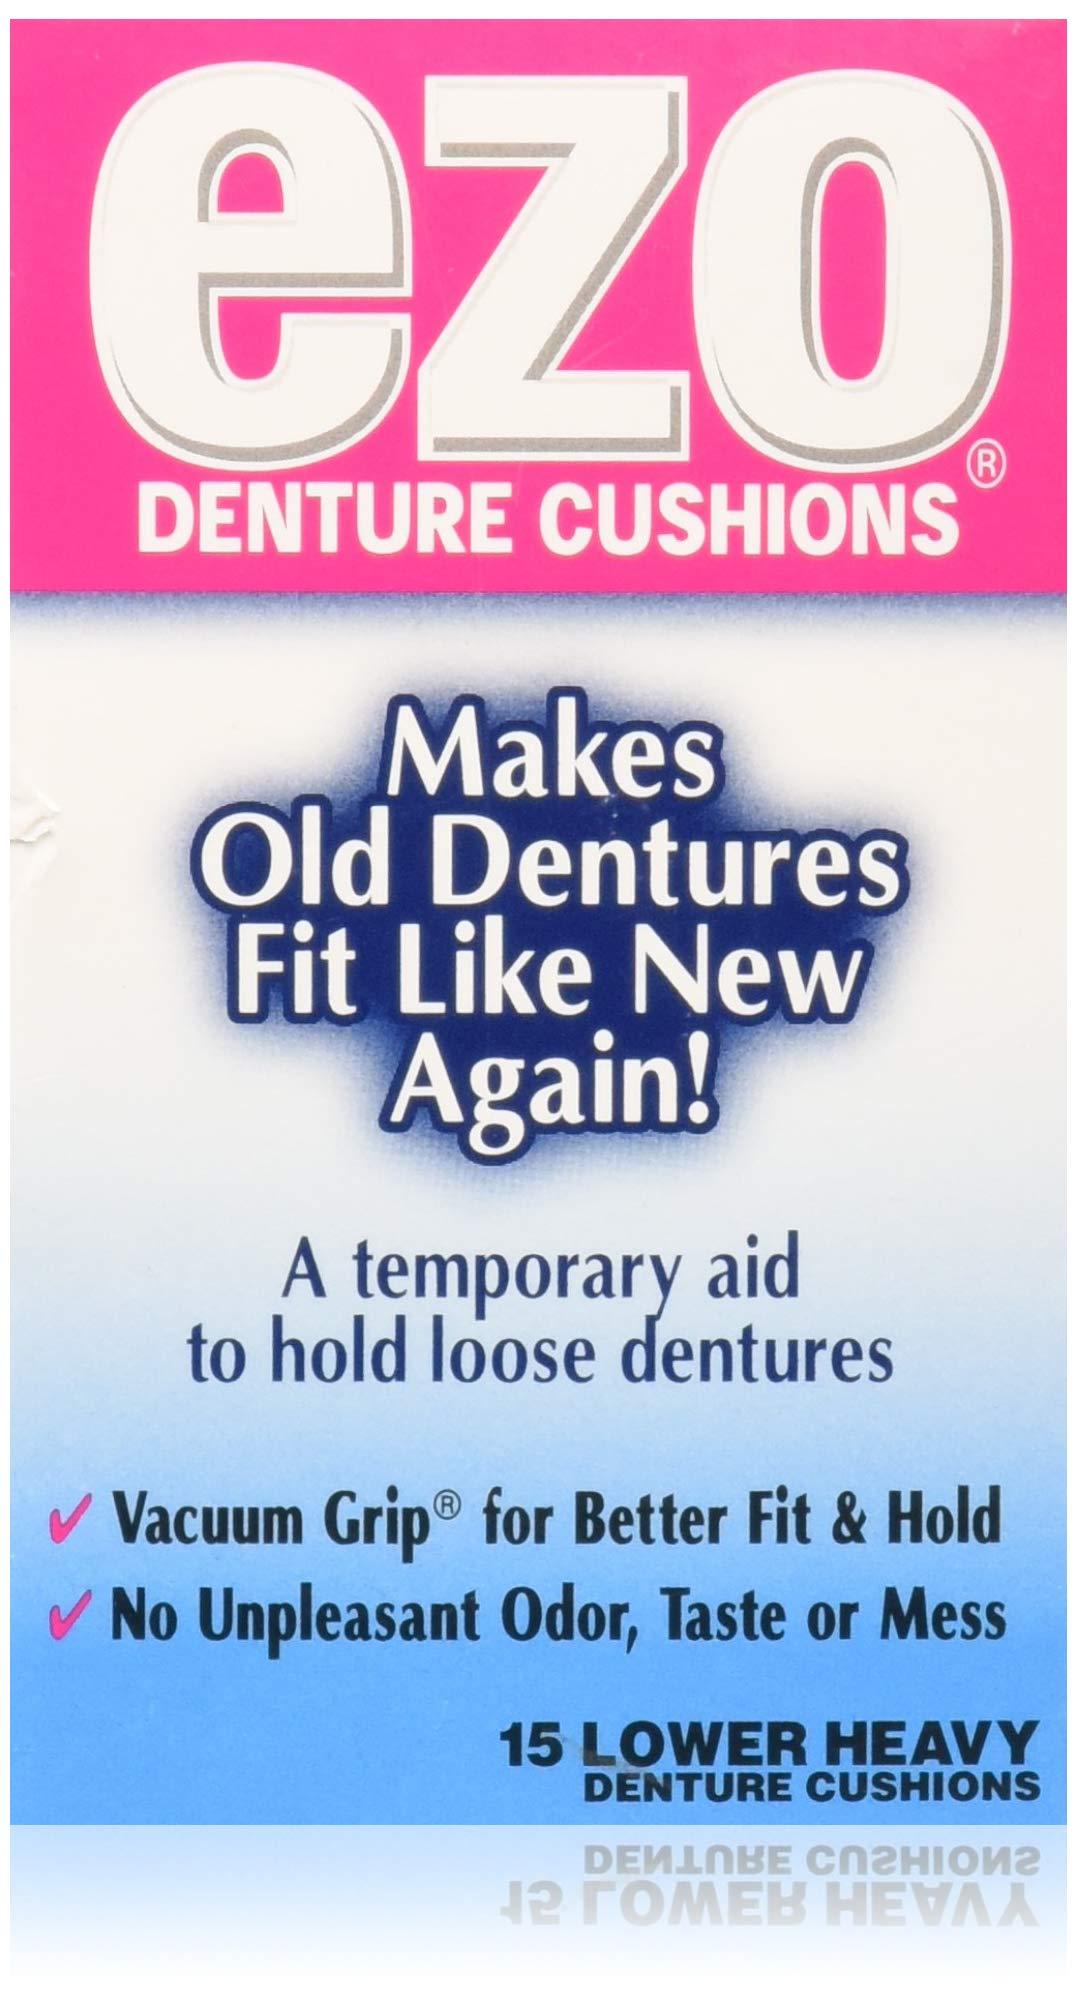 Ezo Denture Cushions, Lower Heavy, 15 cushions (Pack of 1)